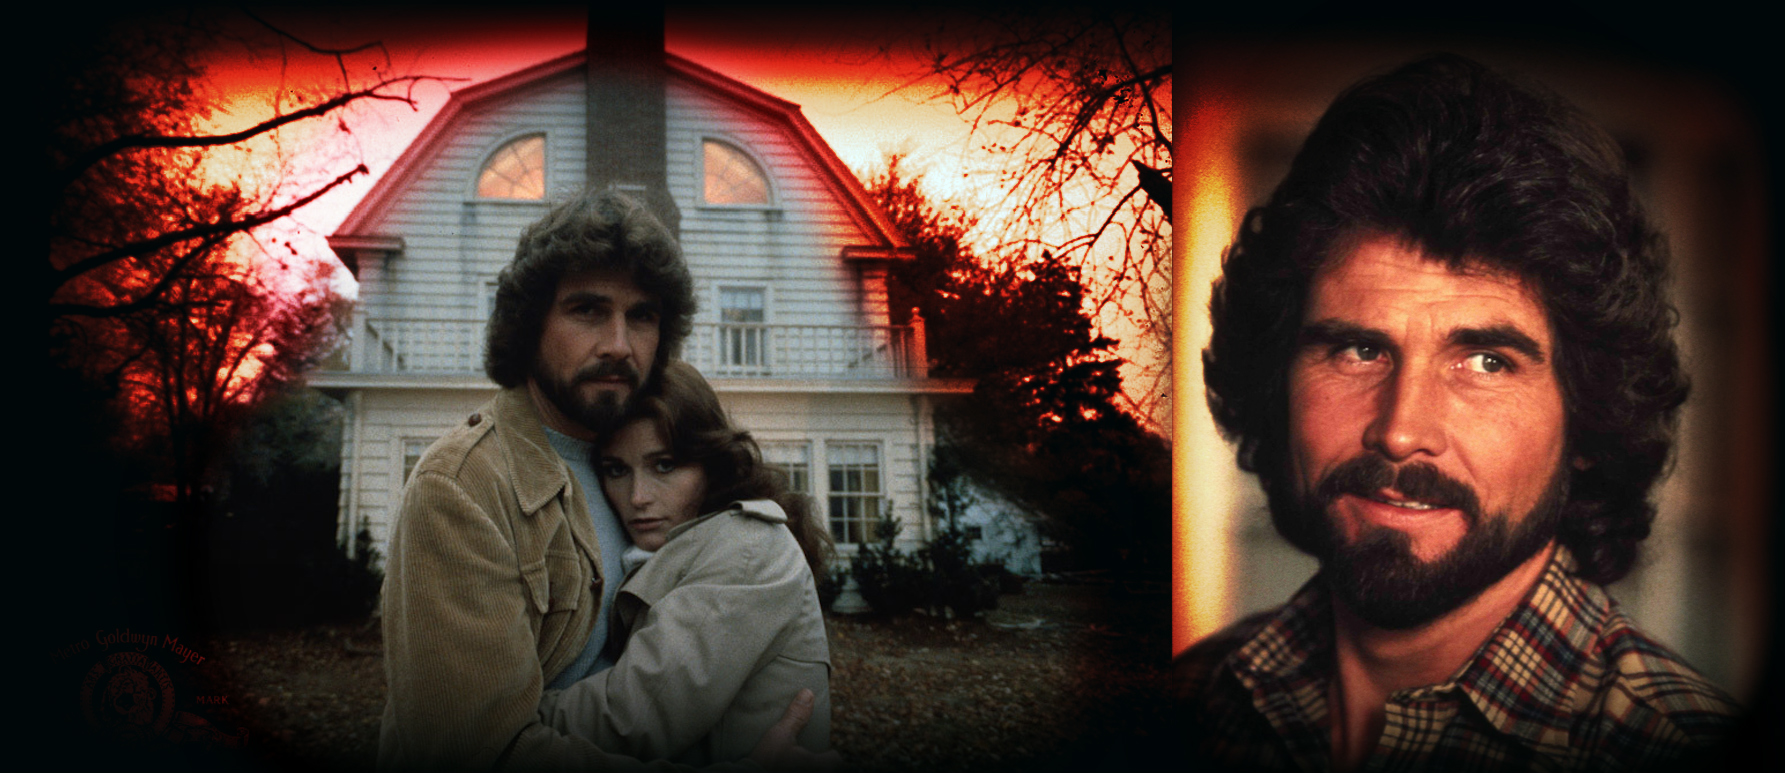 Robert Tharp Your Choice : The Amityville Horror